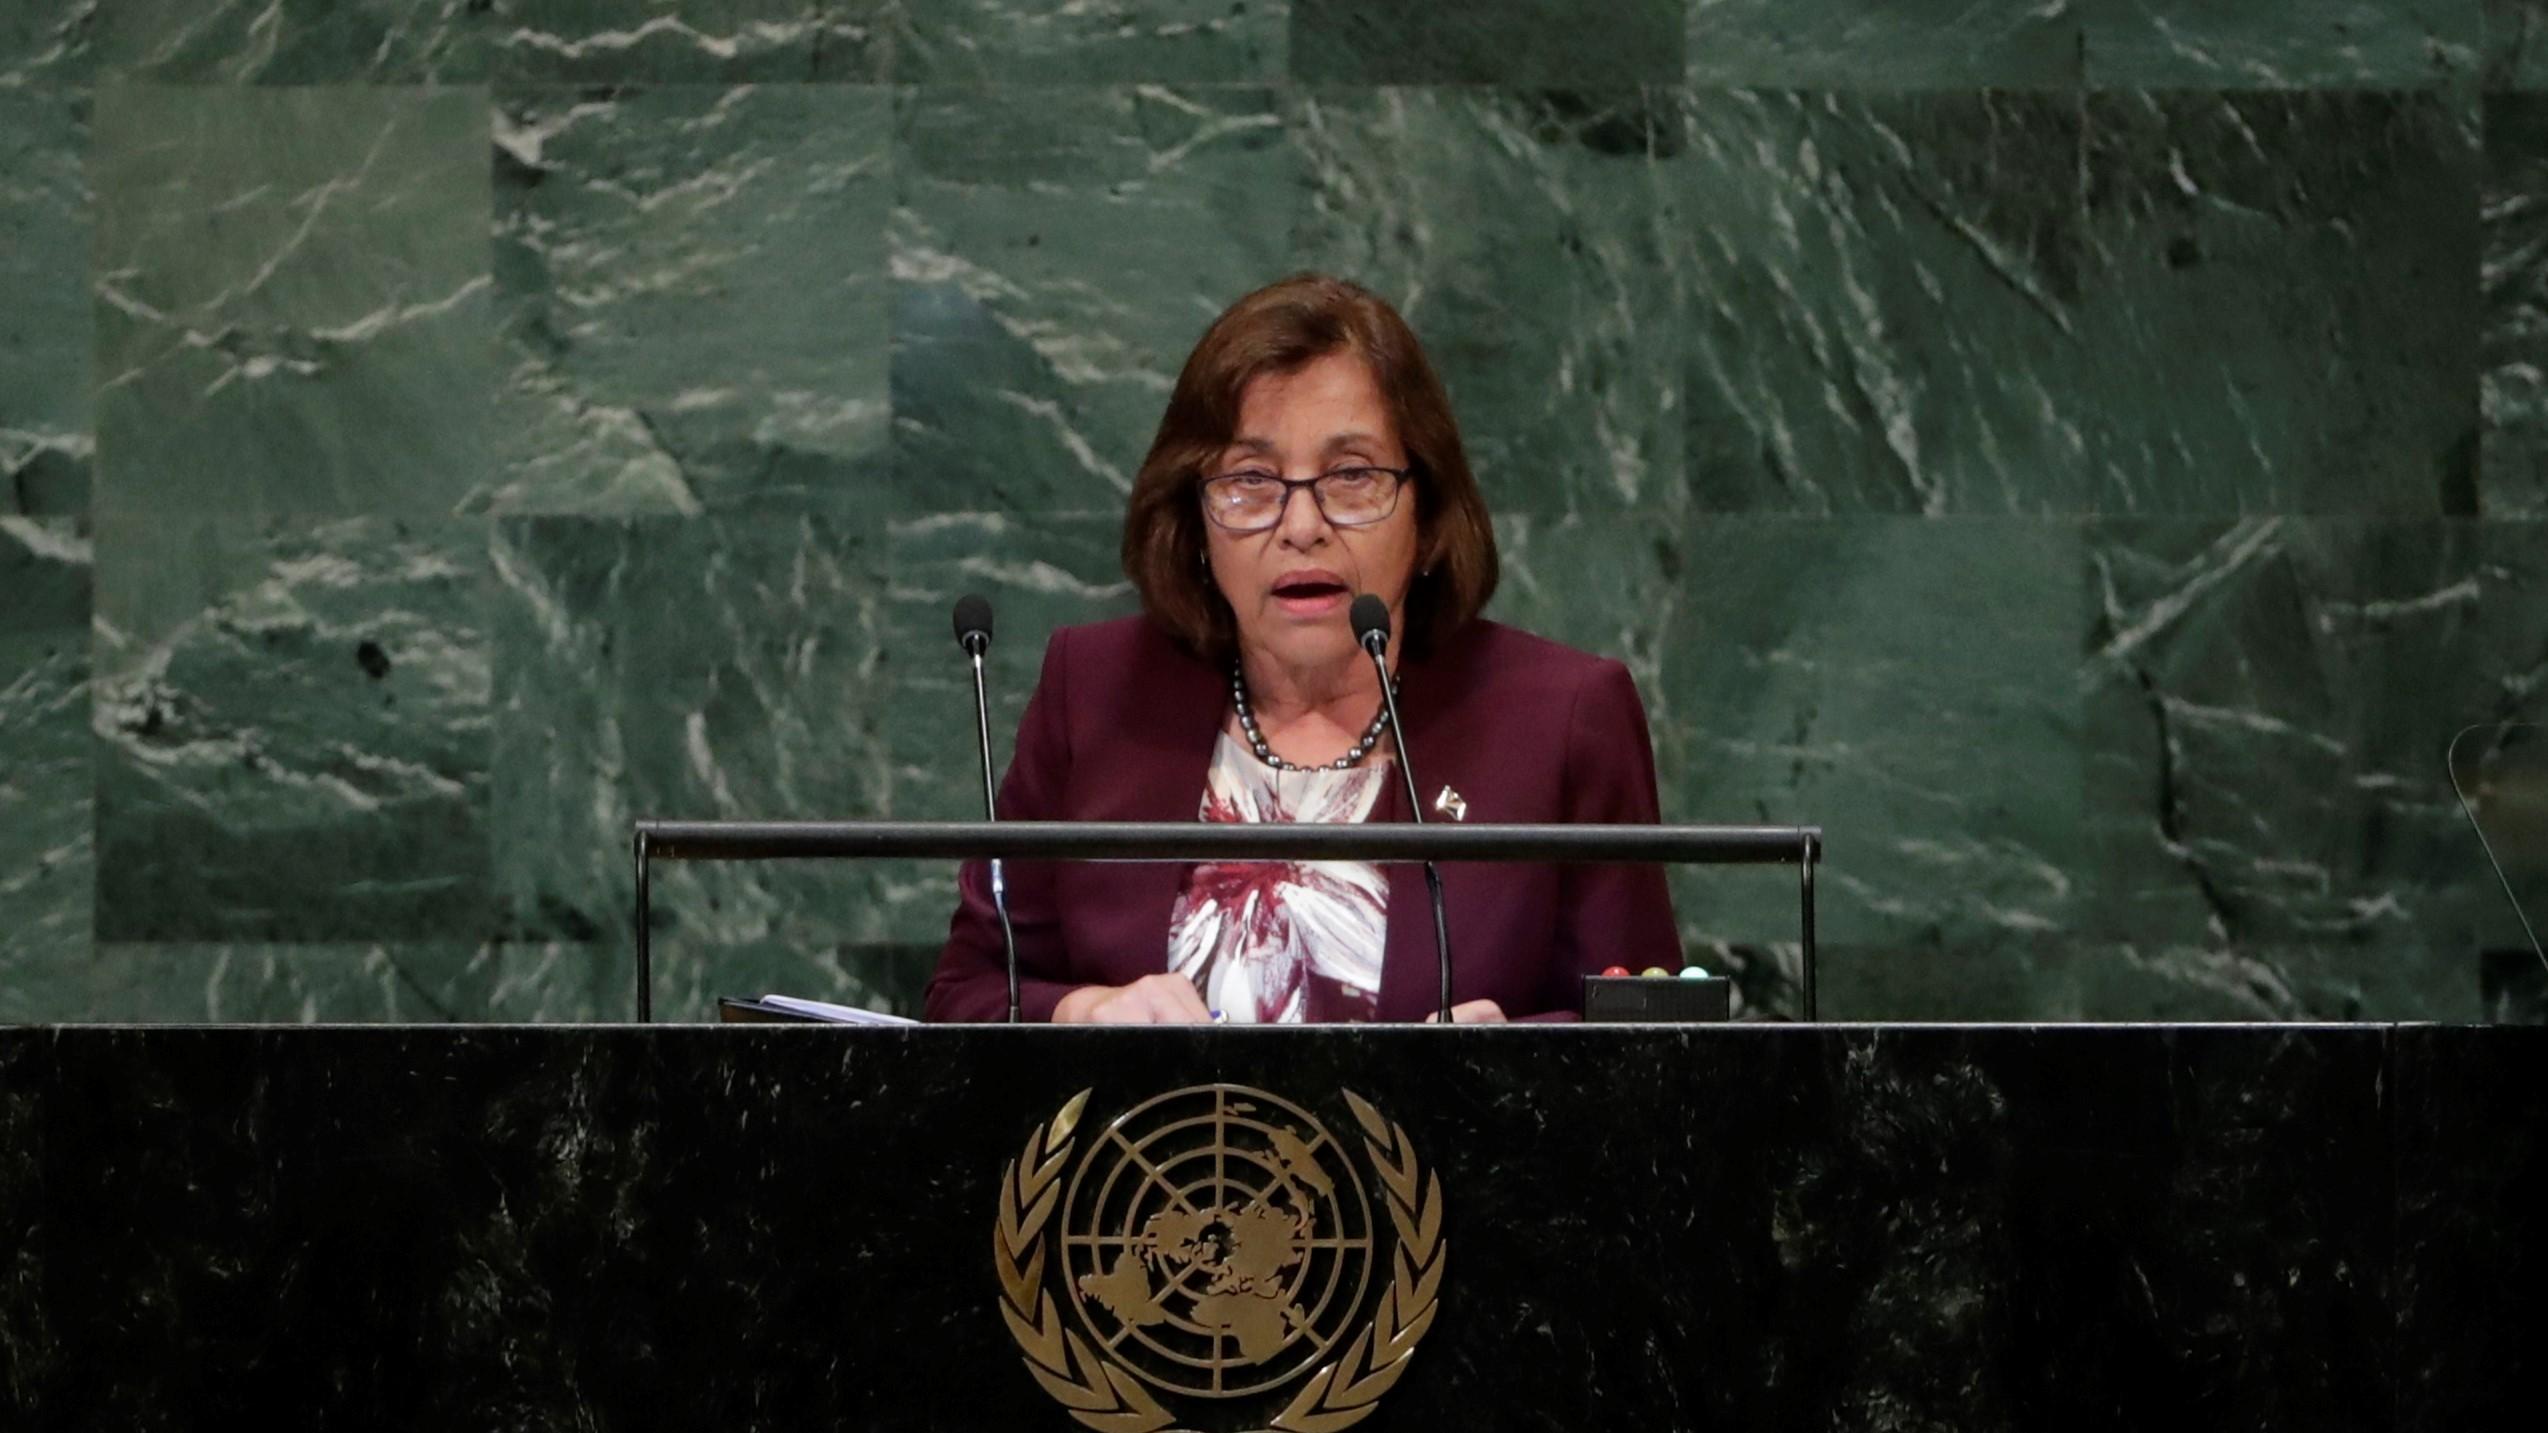 Marshallese President Hilda Heine speaking to the United Nations.